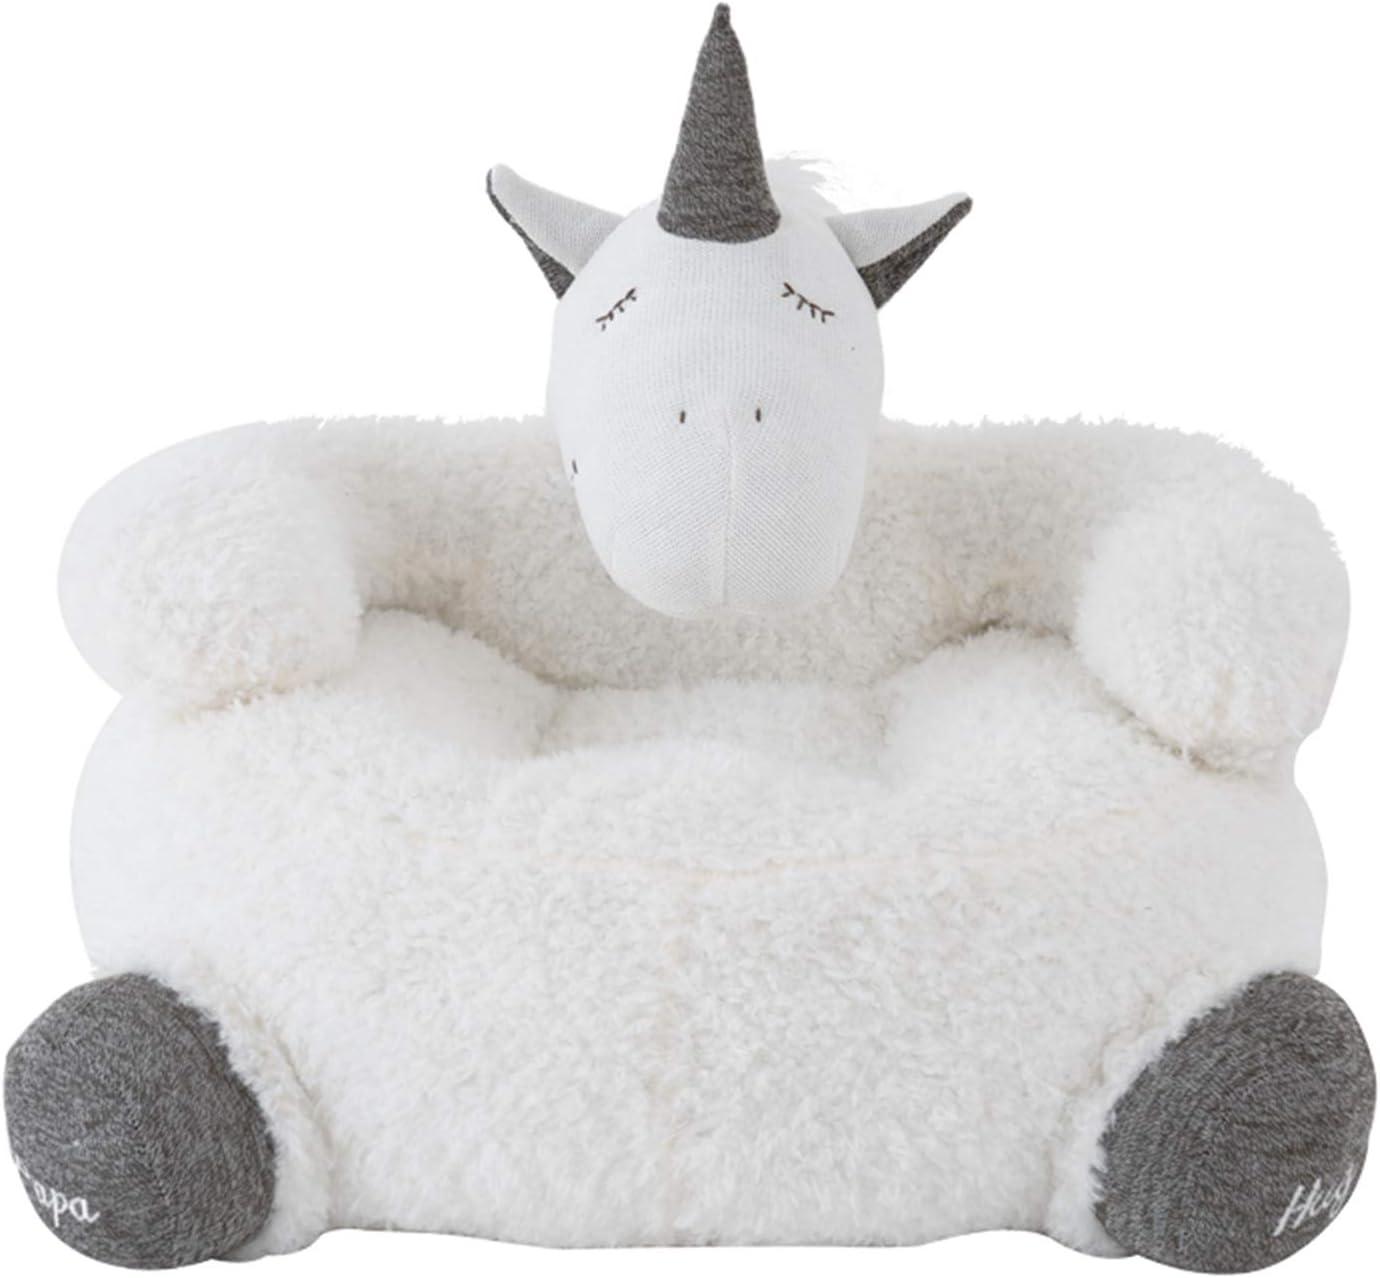 XLSQW Max 49% OFF Plush Children's Sofa Backrest S Cute Animal Cartoon Store Chair